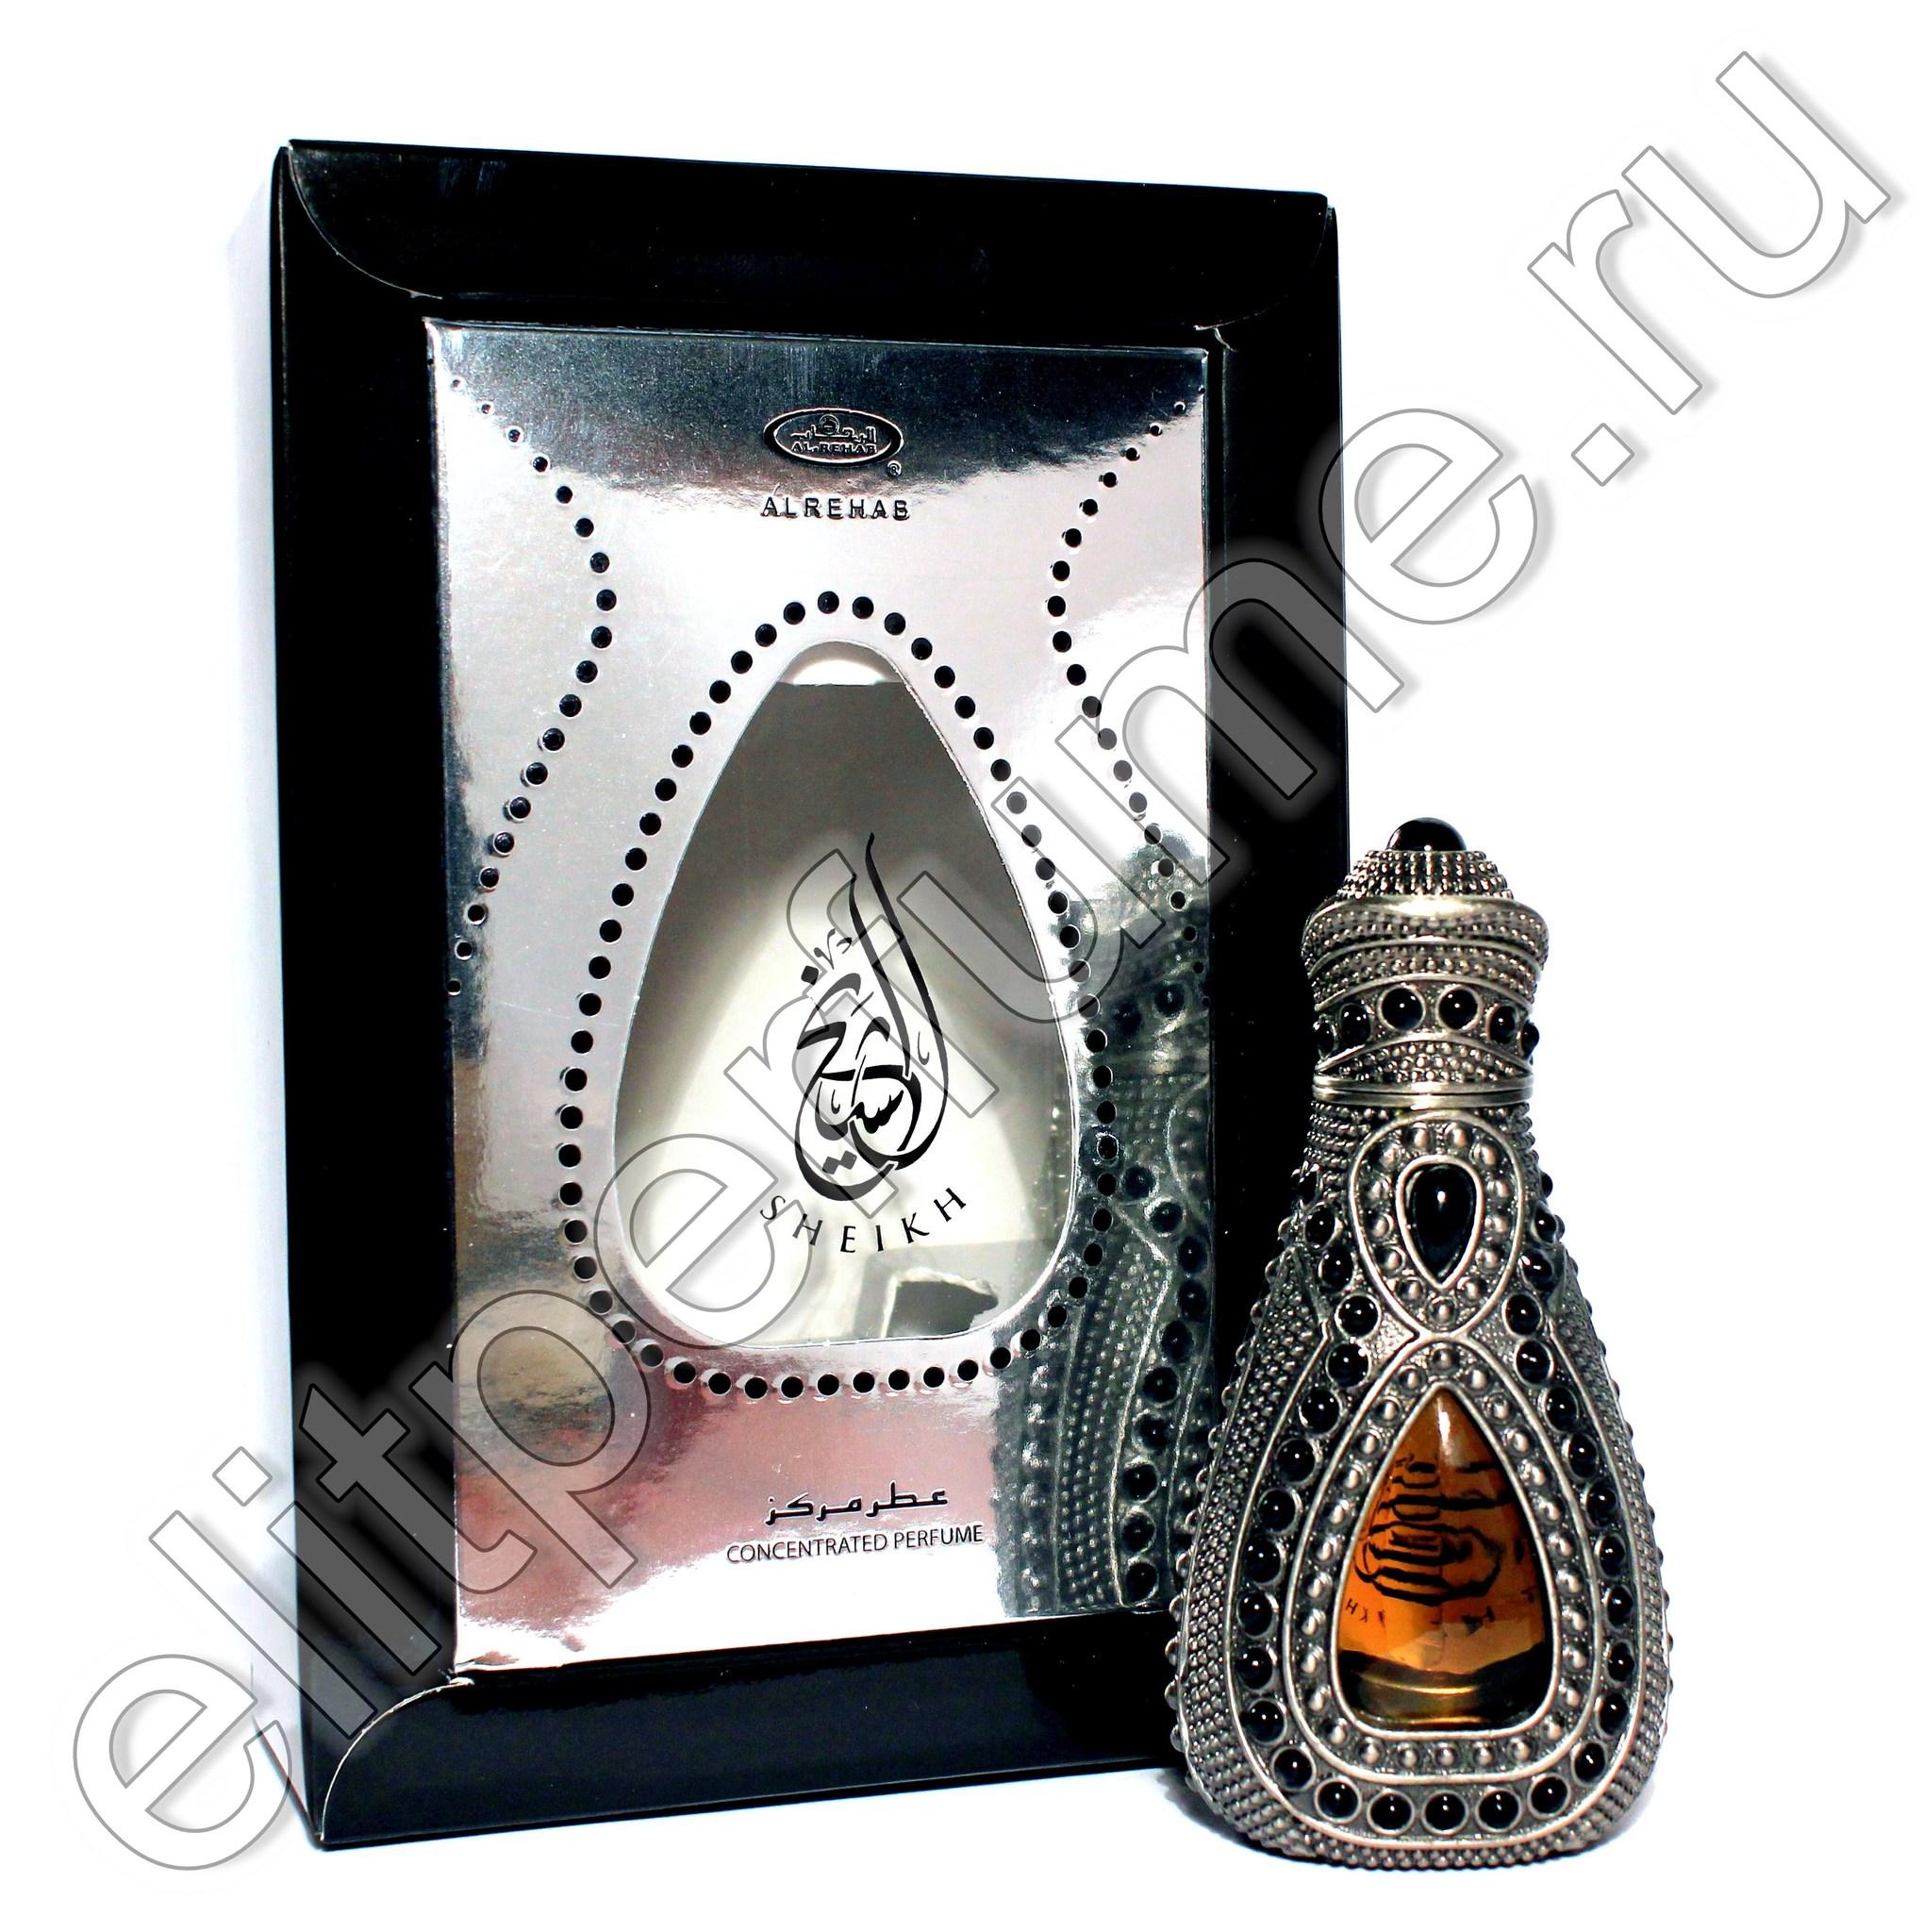 Al Rehab Sheikh / Шейх 15 мл арабские масляные духи от Аль Рехаб Al Rehab